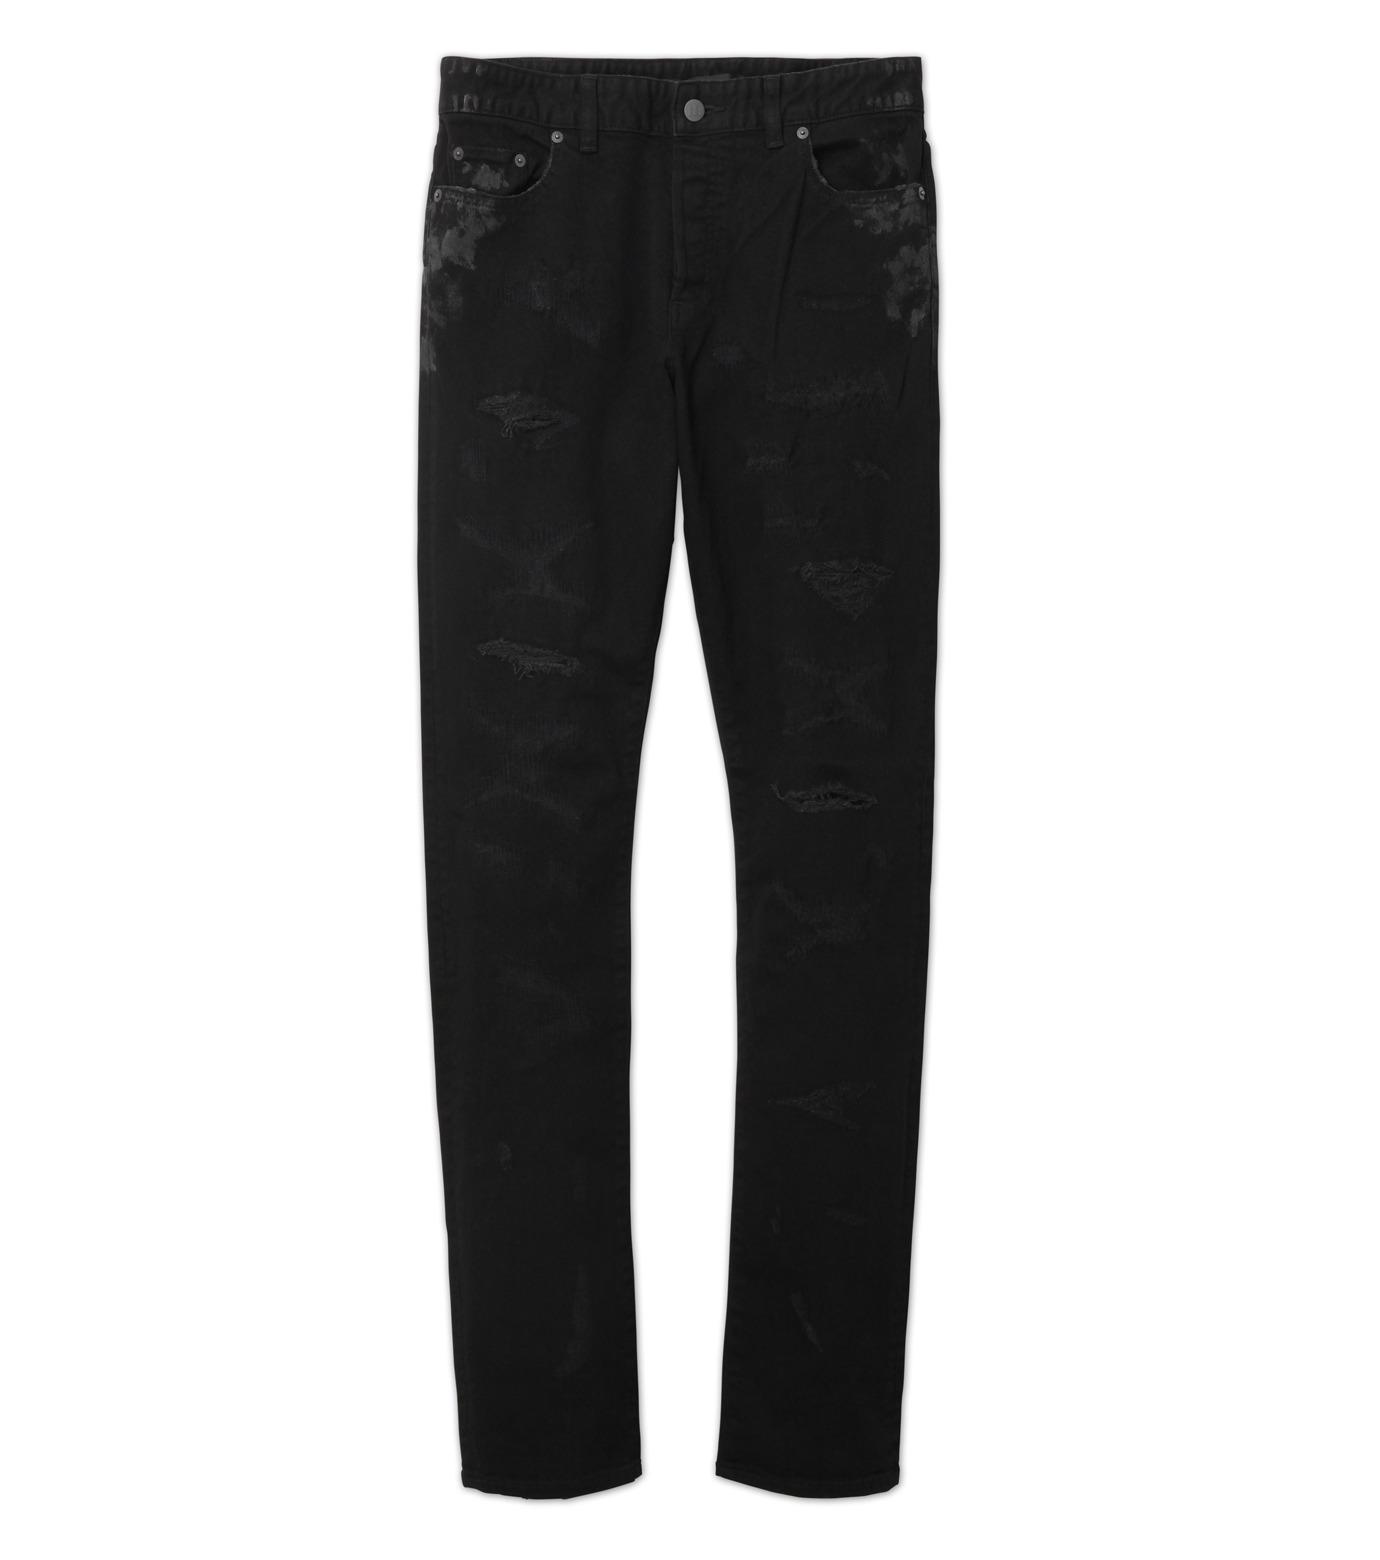 HL HEDDIE LOVU(エイチエル・エディールーヴ)のBlack Damege HL-BLACK(パンツ/pants)-17A98002-13 拡大詳細画像6